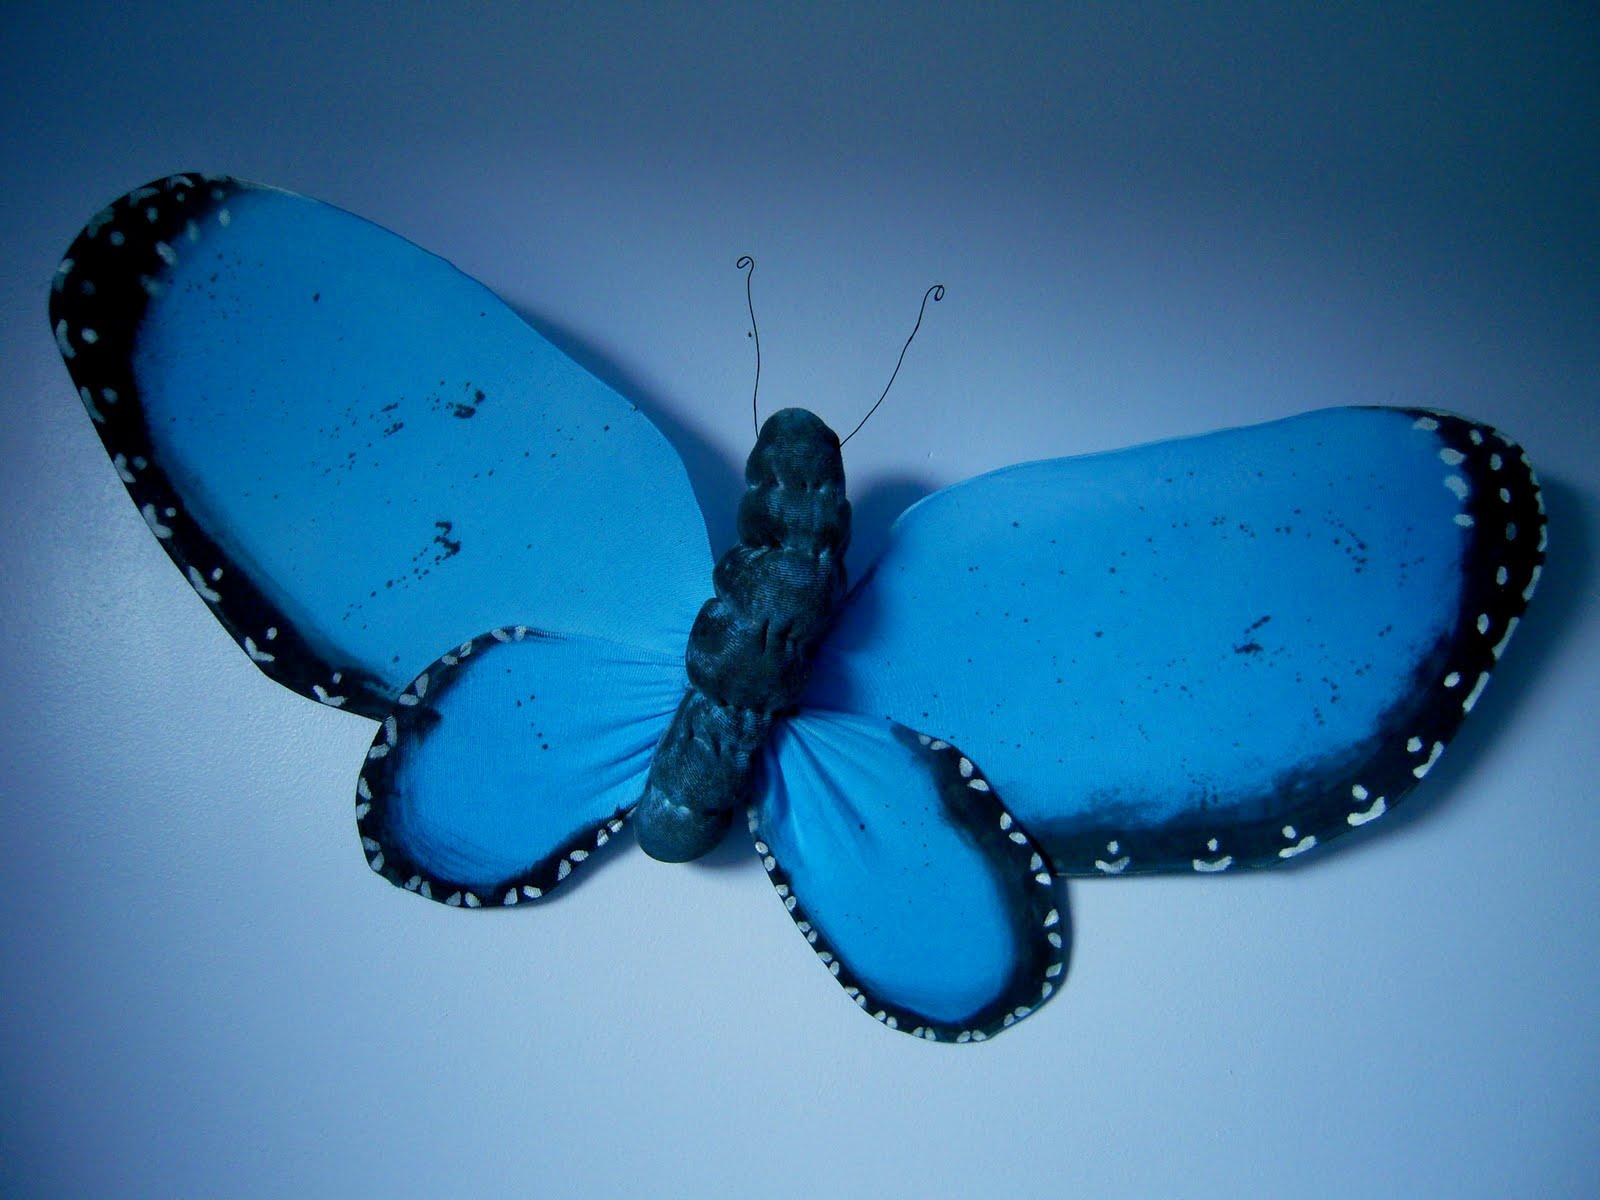 marvelously messy blue morpho butterfly craft